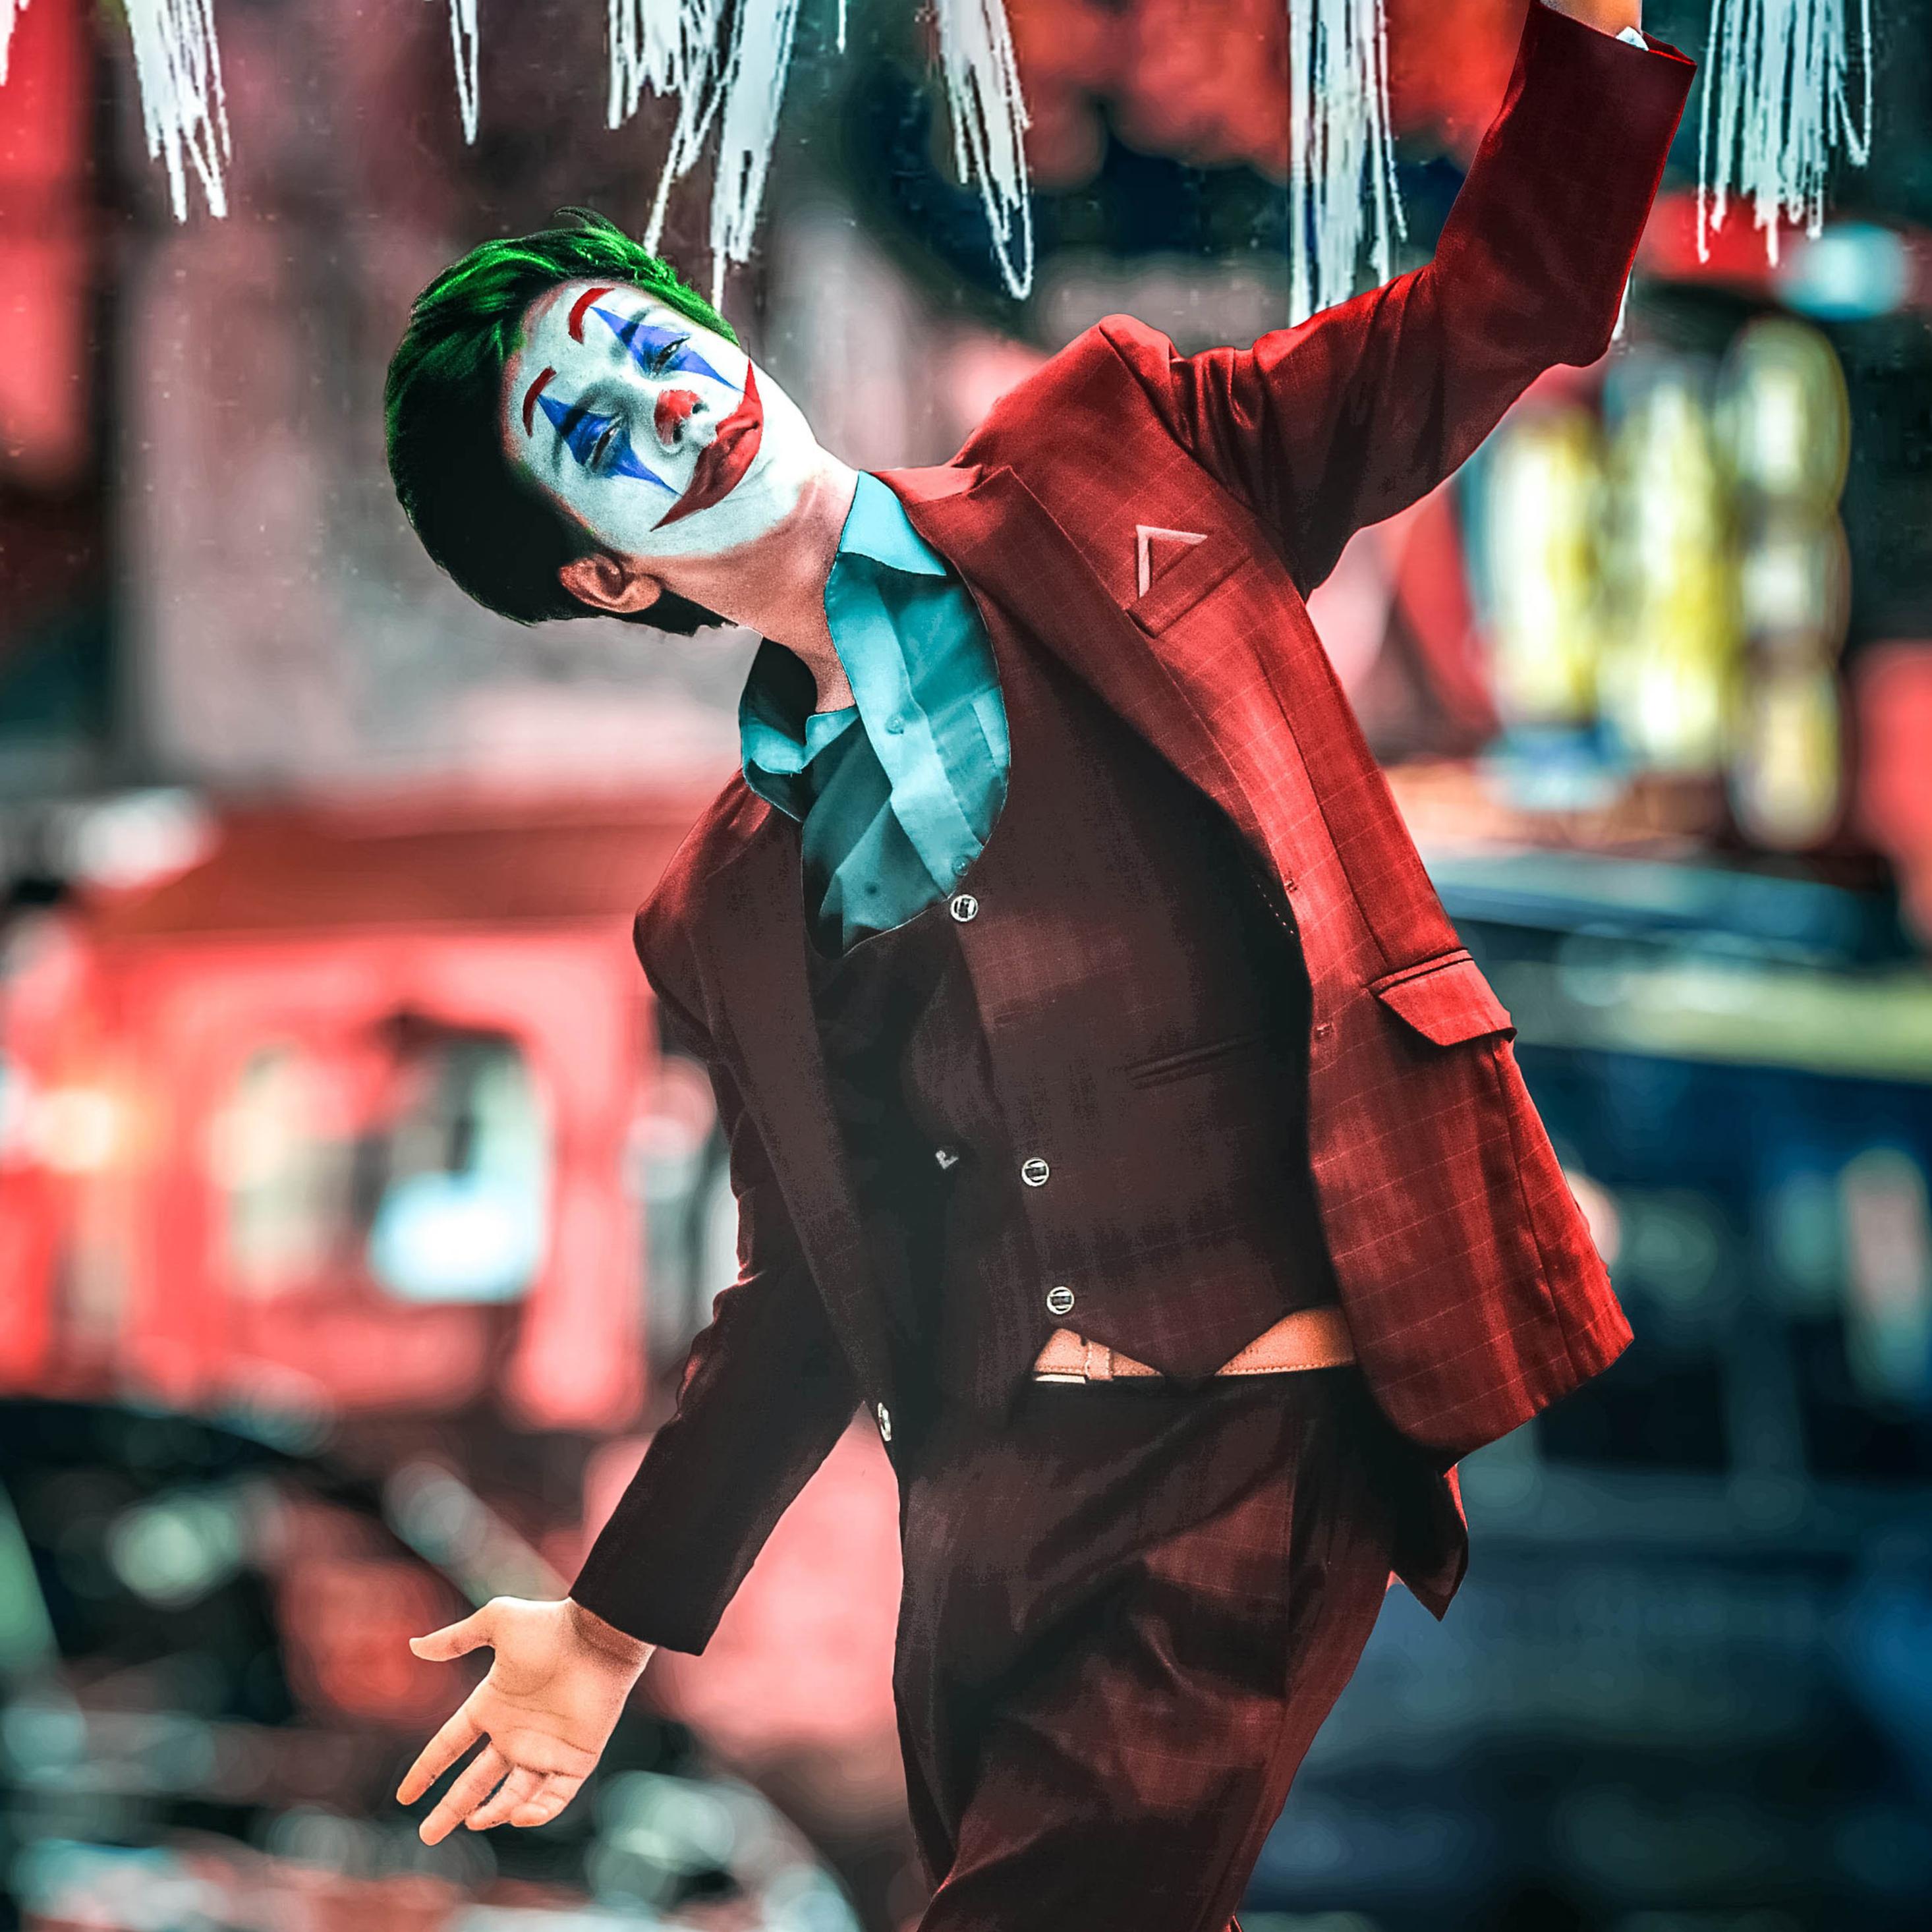 joker-cosplay-2020-4k-9d.jpg